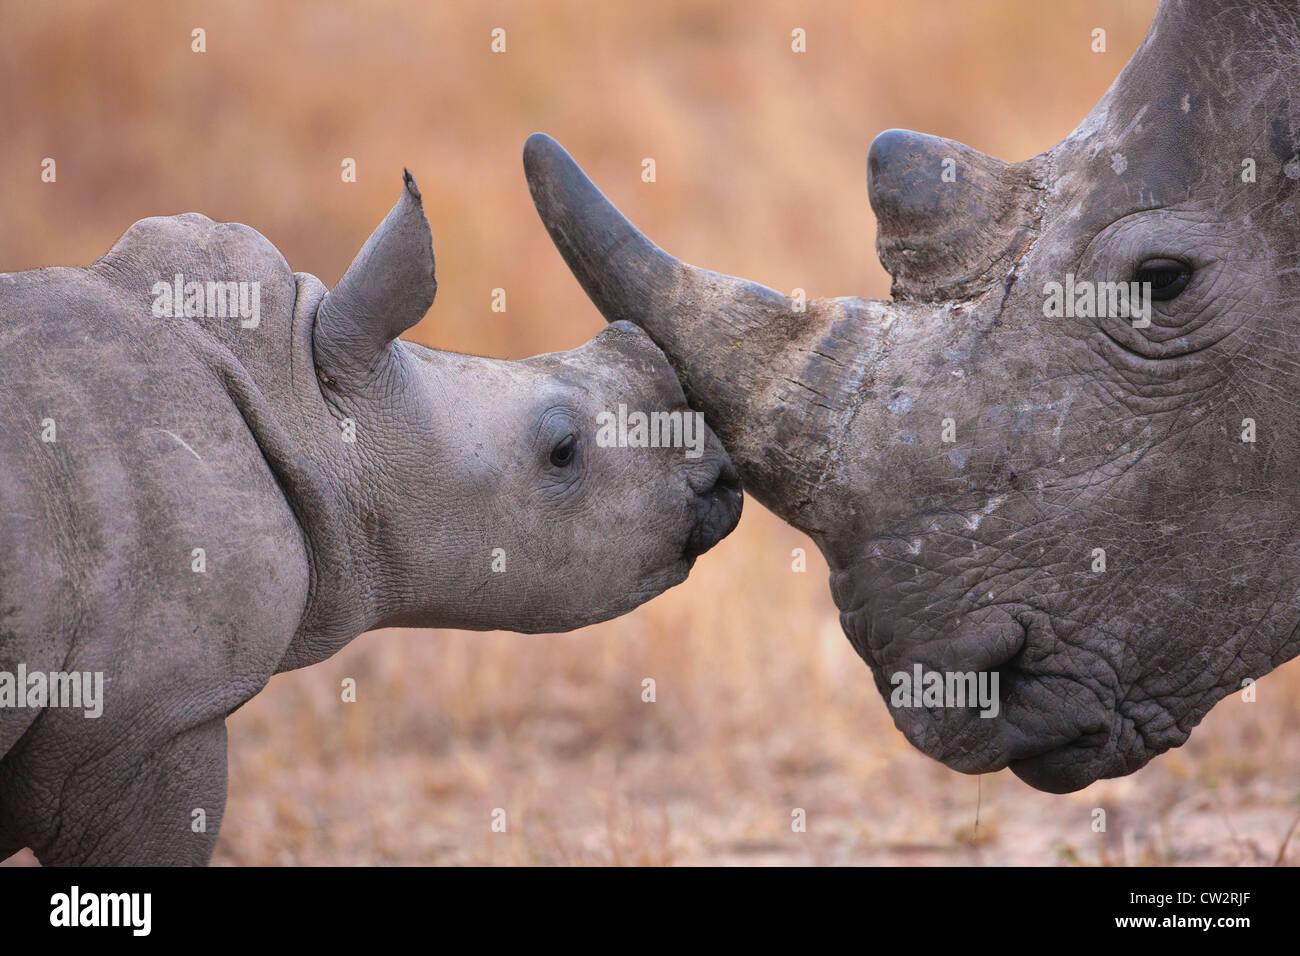 Rhinocéros blanc bébé nuzzling sa mère Photo Stock